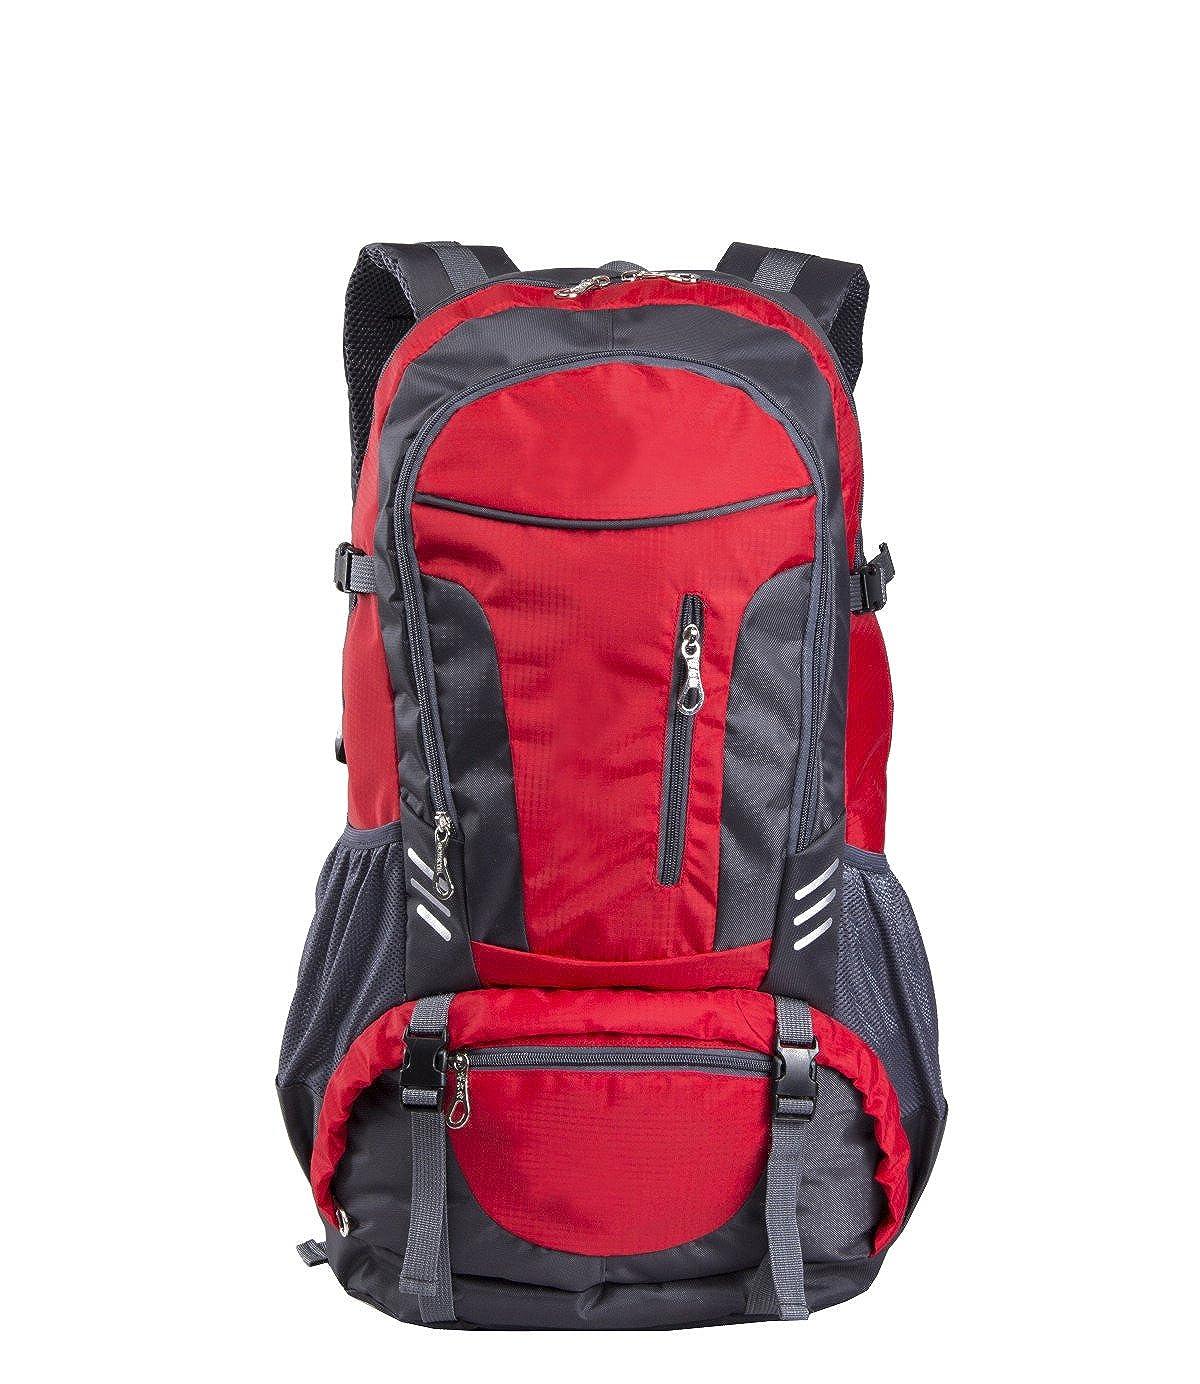 1 One Size LAIDAYE Large Capacity Bag Shoulder Bag Travel Bag Outdoor Bag Multifunctional Package Backpack